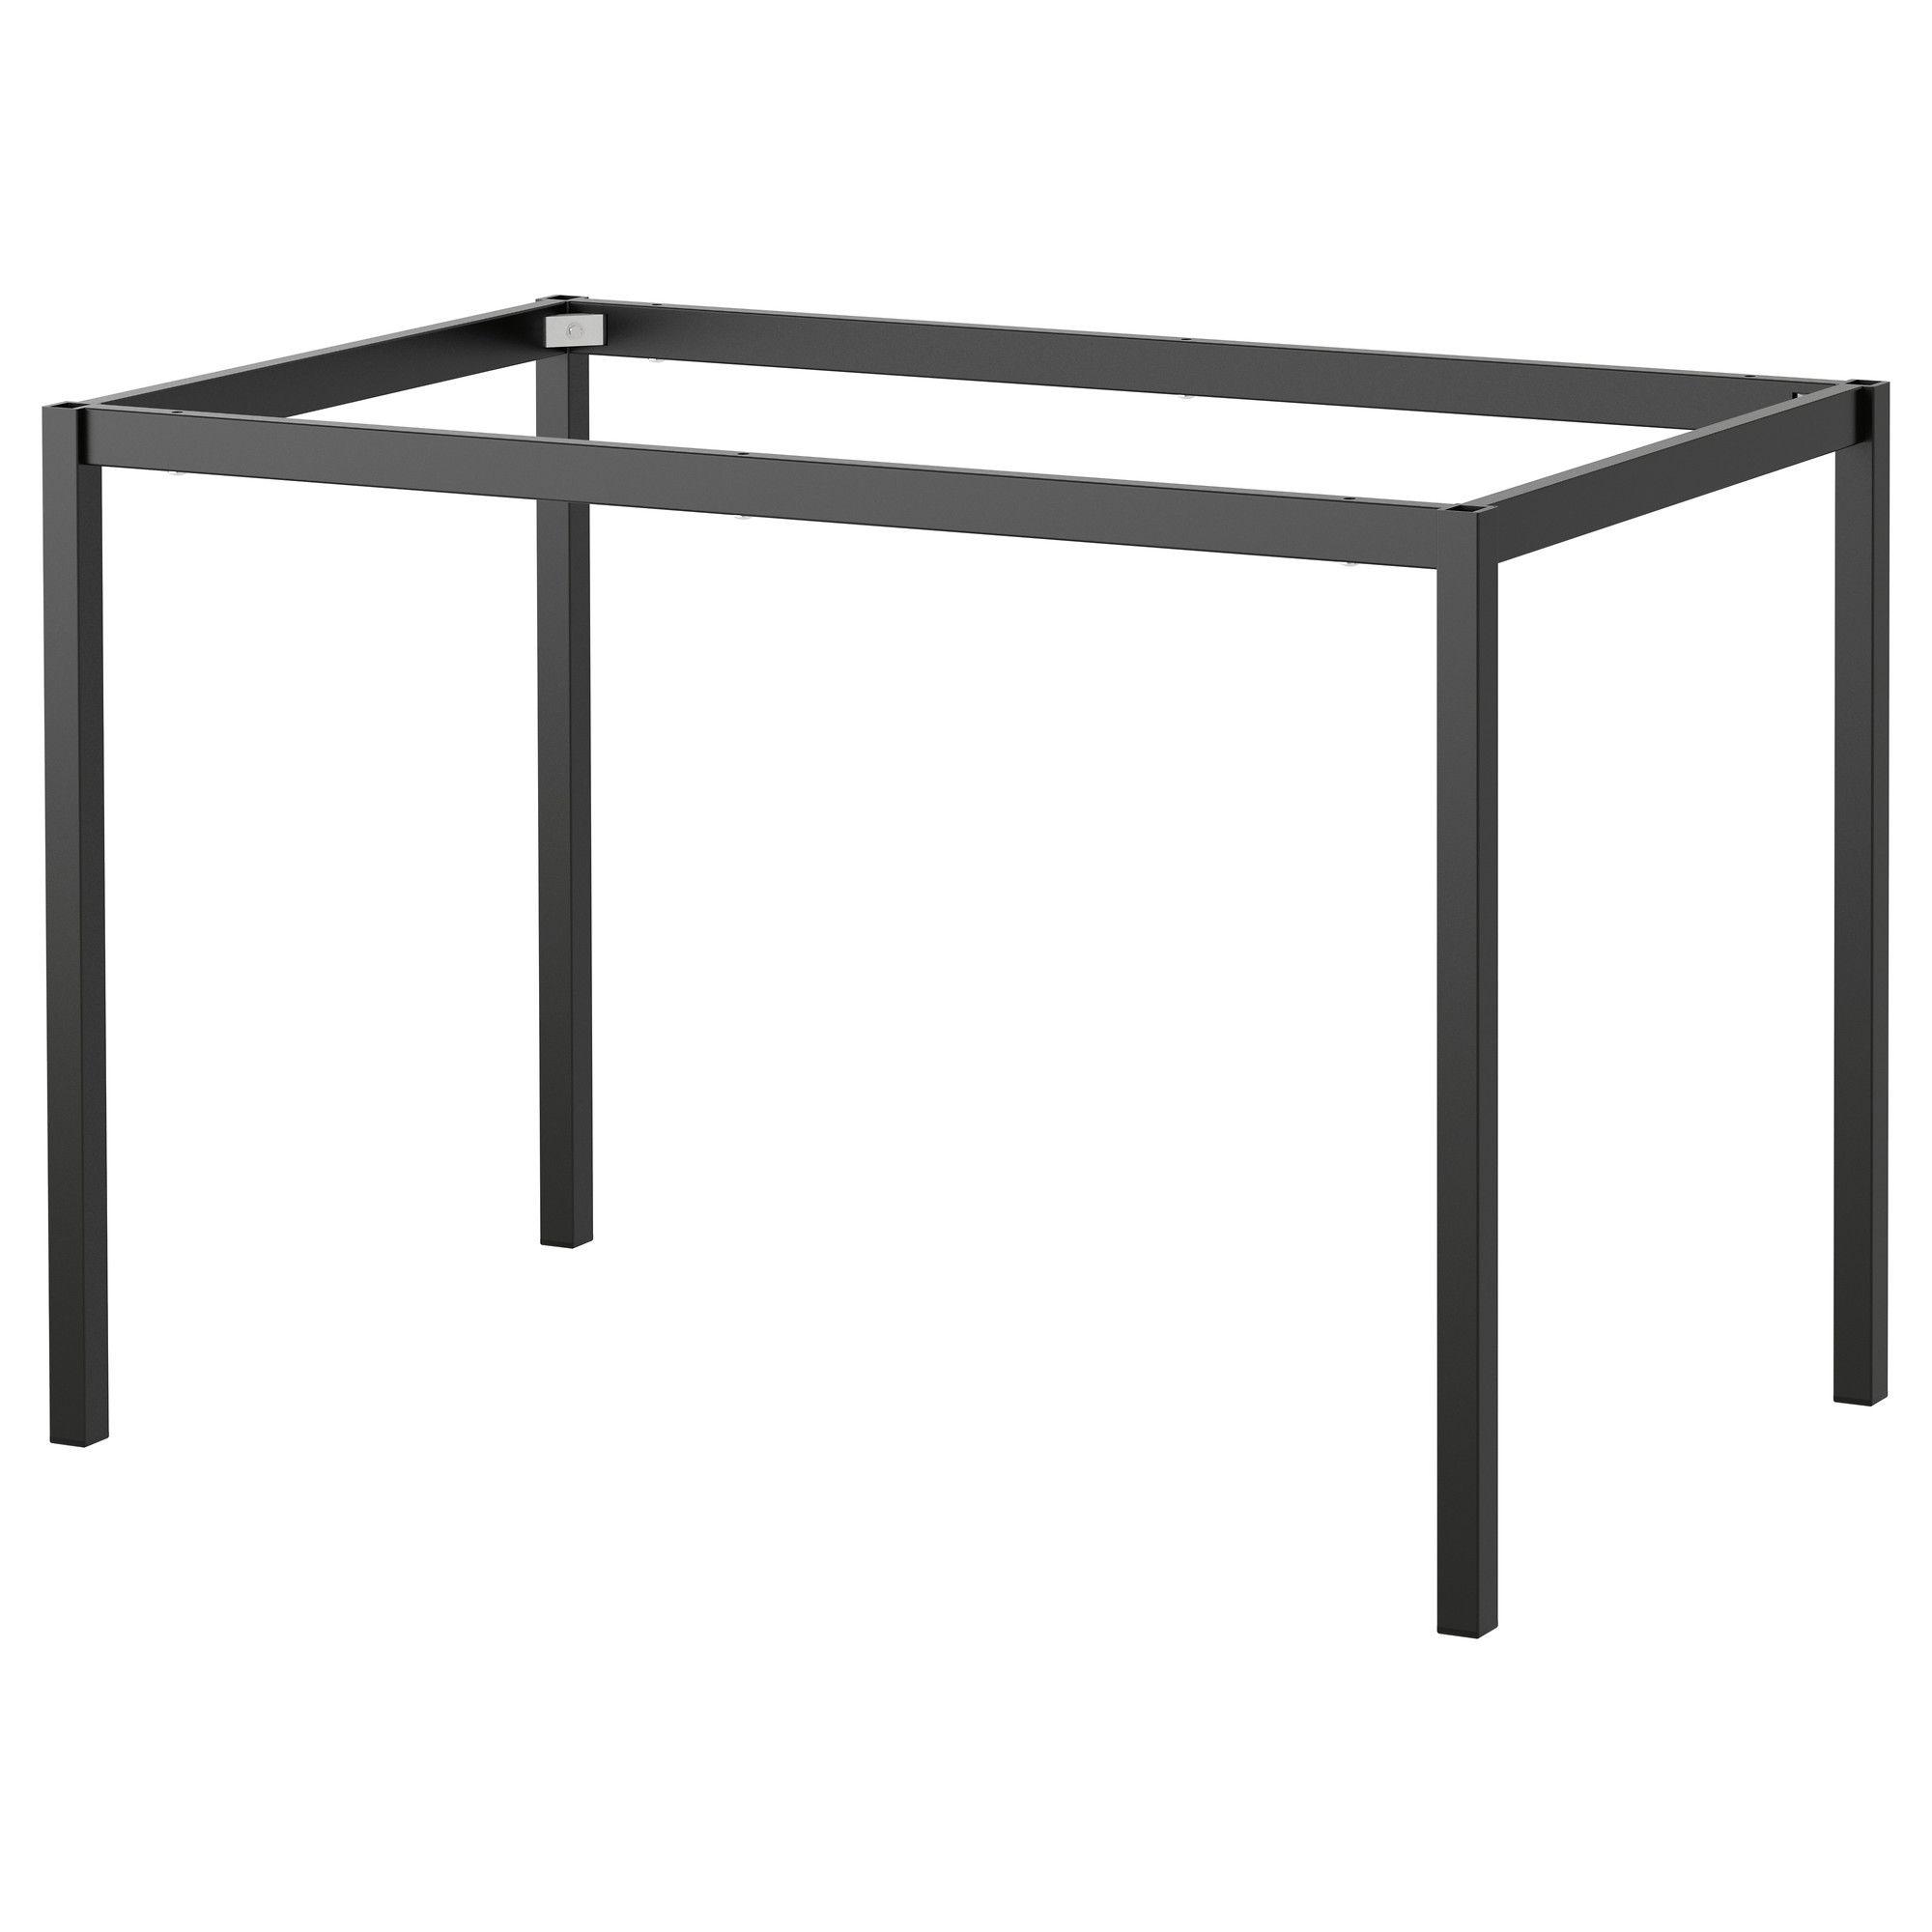 Tarendo Underframe Black 43 1 4x26 3 8 Ikea